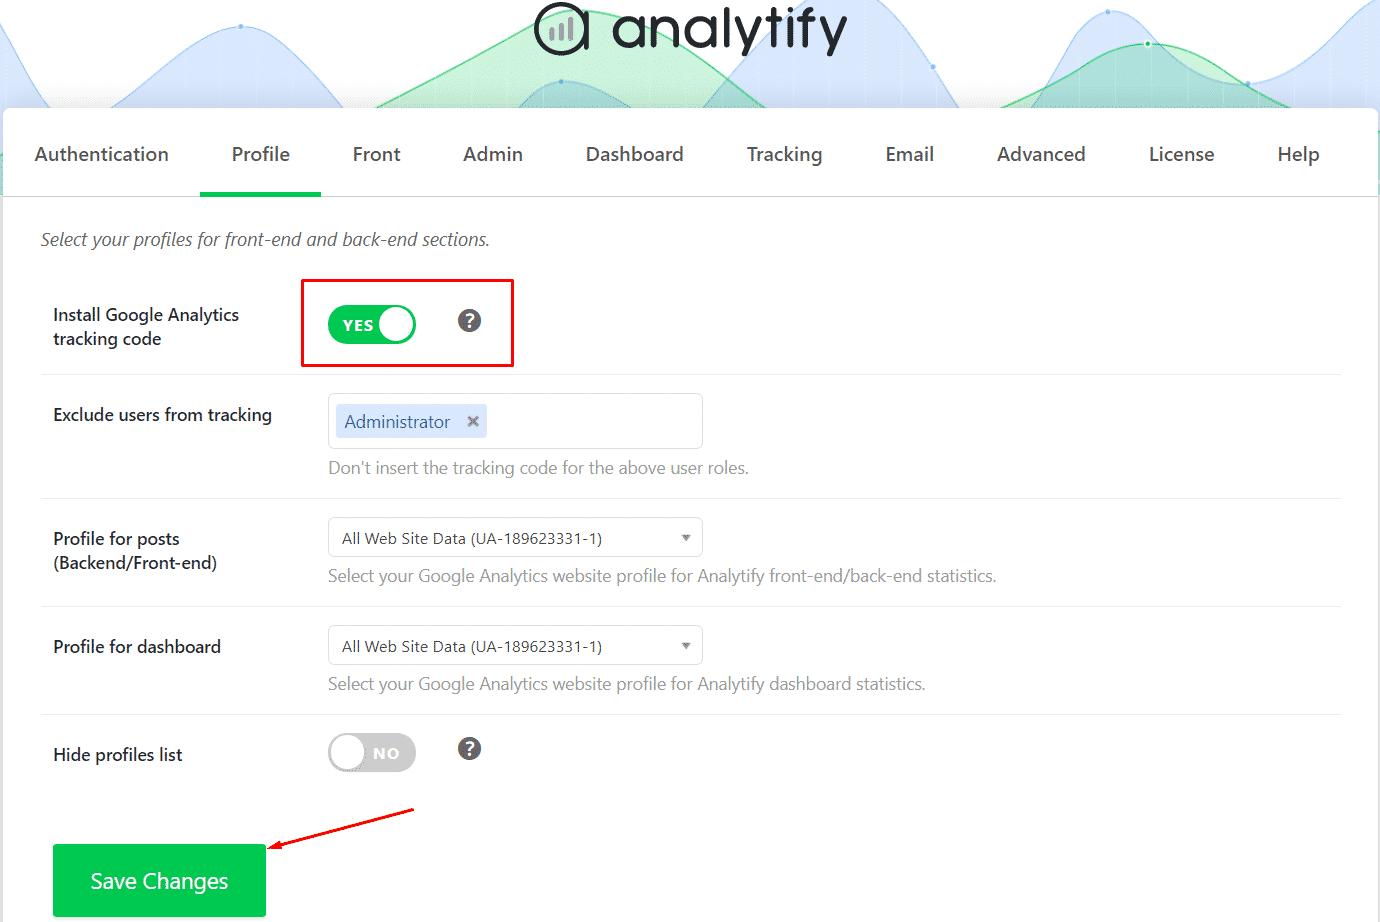 Enable Install Google Analytics tracking code